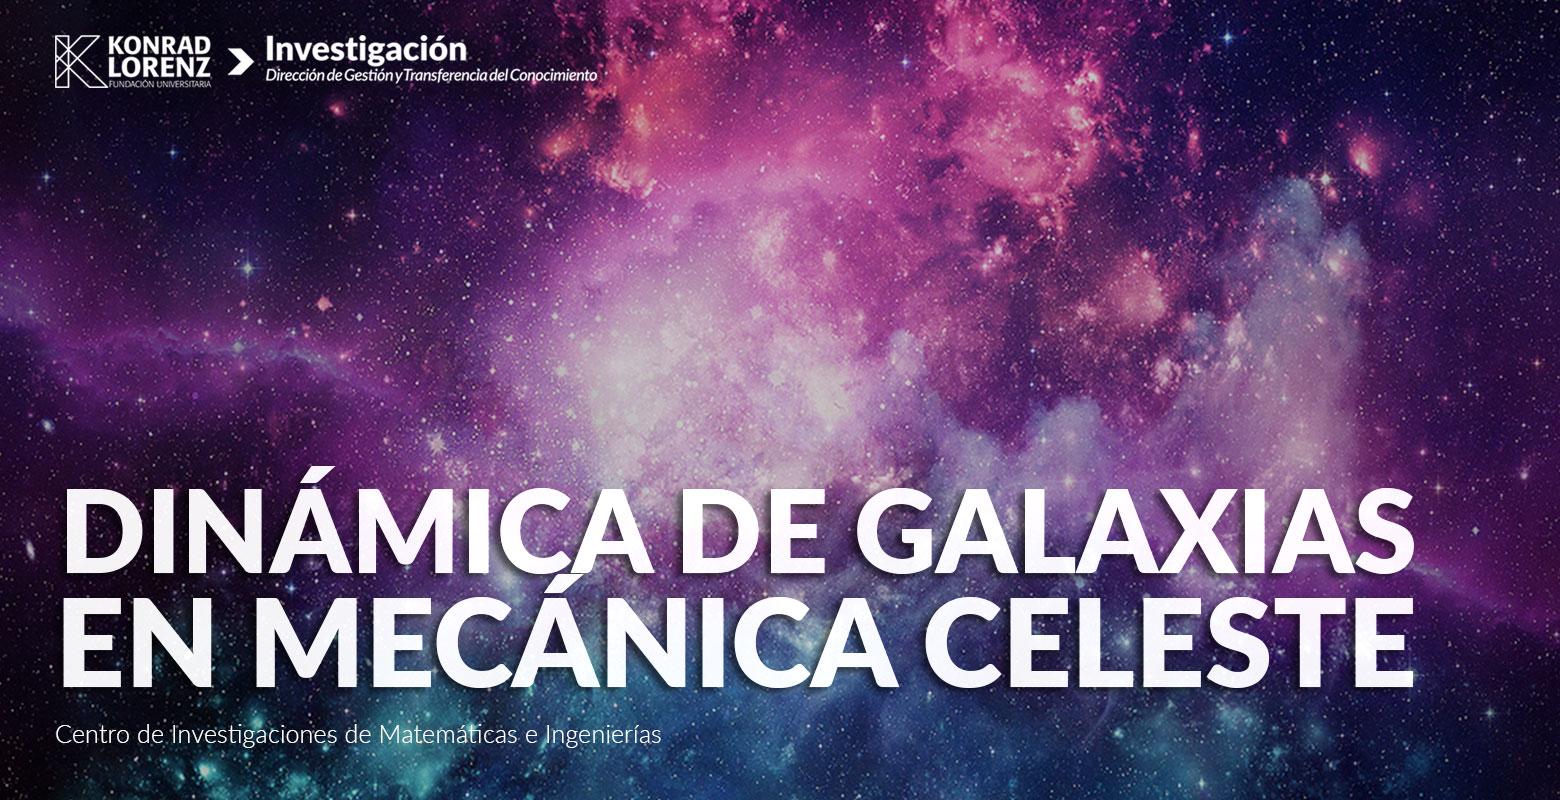 Dinámica de galaxias en mecánica celeste